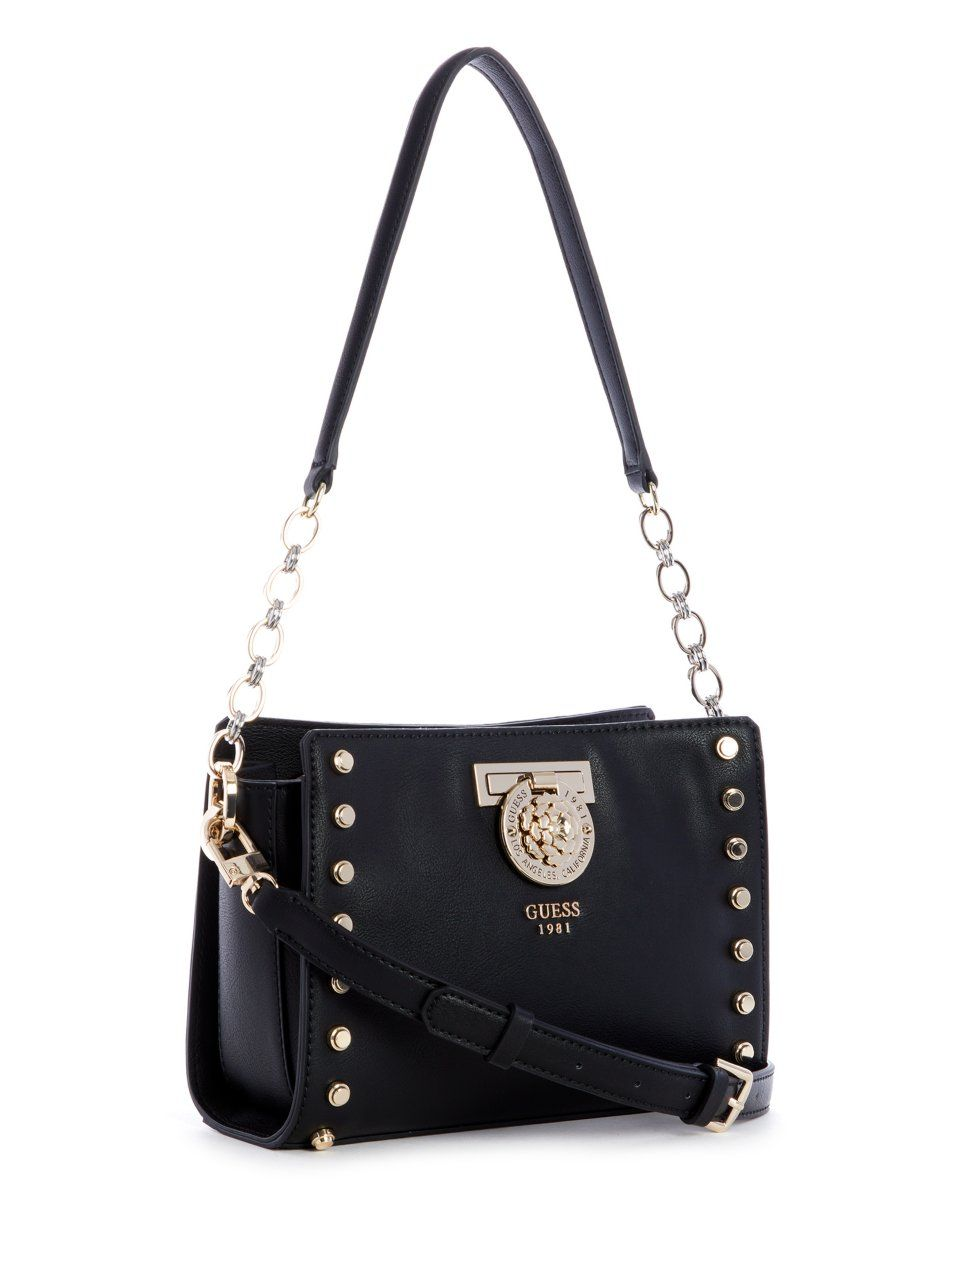 51b095d9d5 Marlene Studded Crossbody | Products in 2019 | Purses, handbags ...